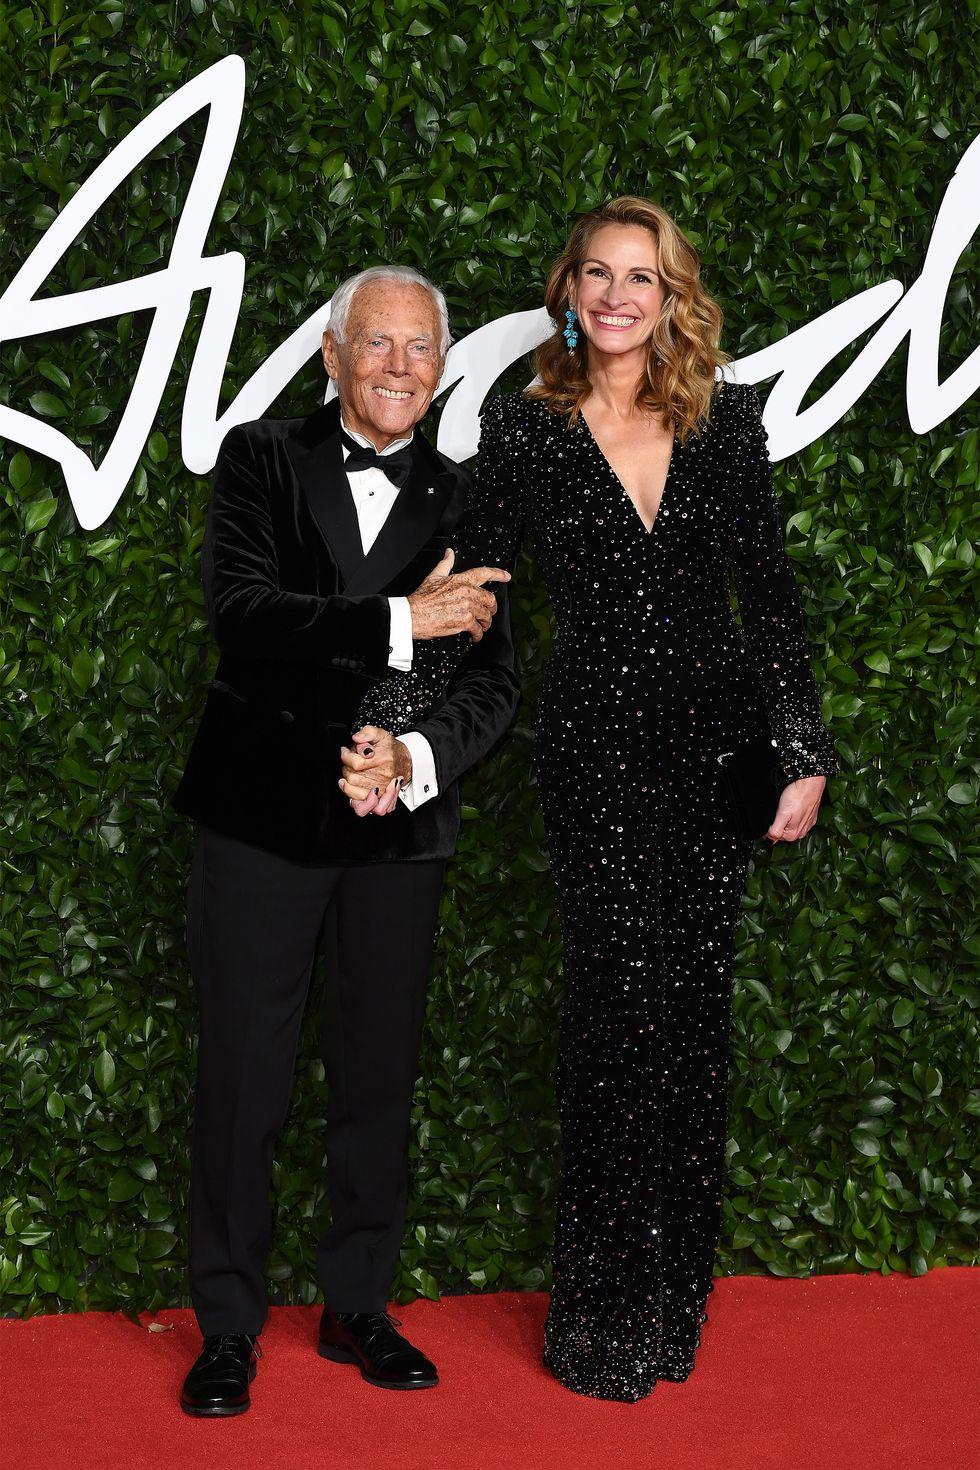 hbz-fashion-awards-2019-giorgio-armani-and-julia-roberts-gettyimages-1191495999